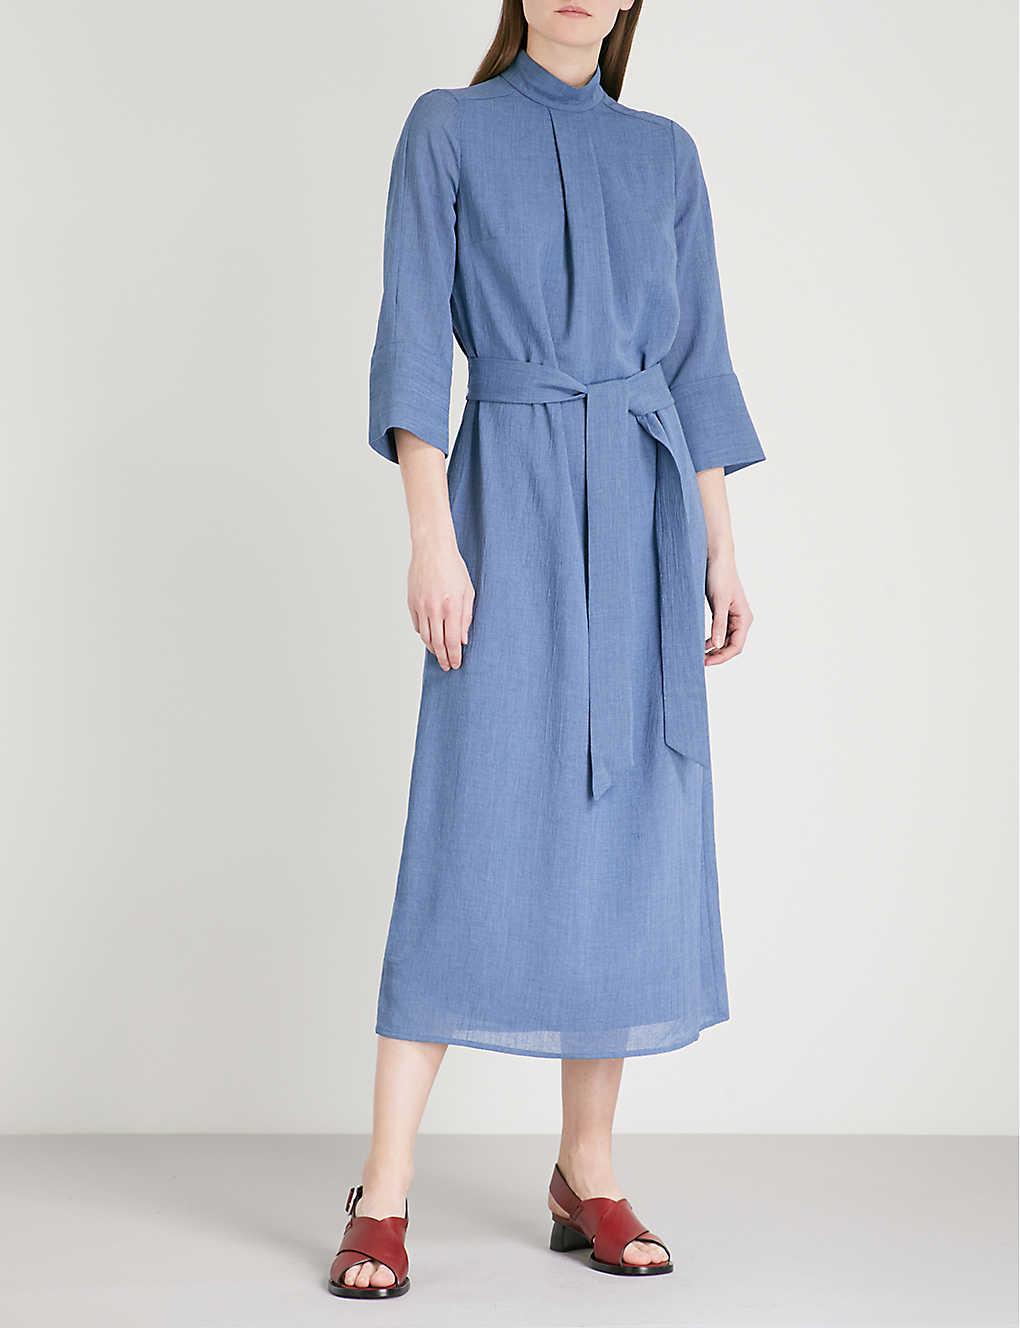 Cefinn Woman Gauze Tunic Black Size 12 Cefinn Discount Huge Surprise Great Deals Sale Online Supply Online Footaction UqKzv